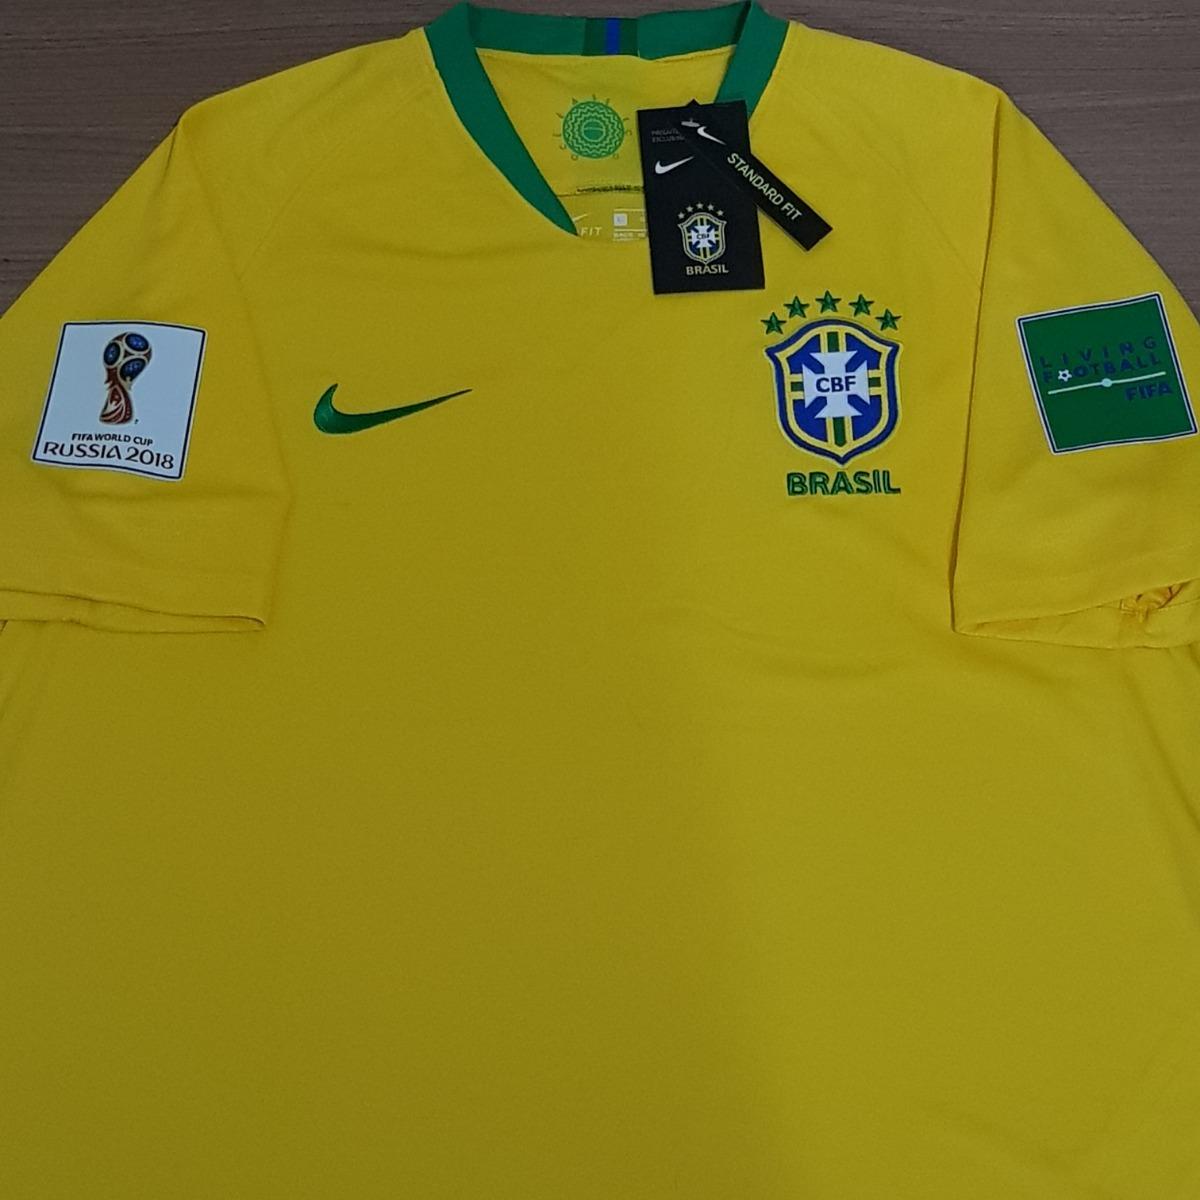 7cbcaa187e2de Camisa Brasil Home 2018 Standerfit Original Pronta Entrega - R  69 ...